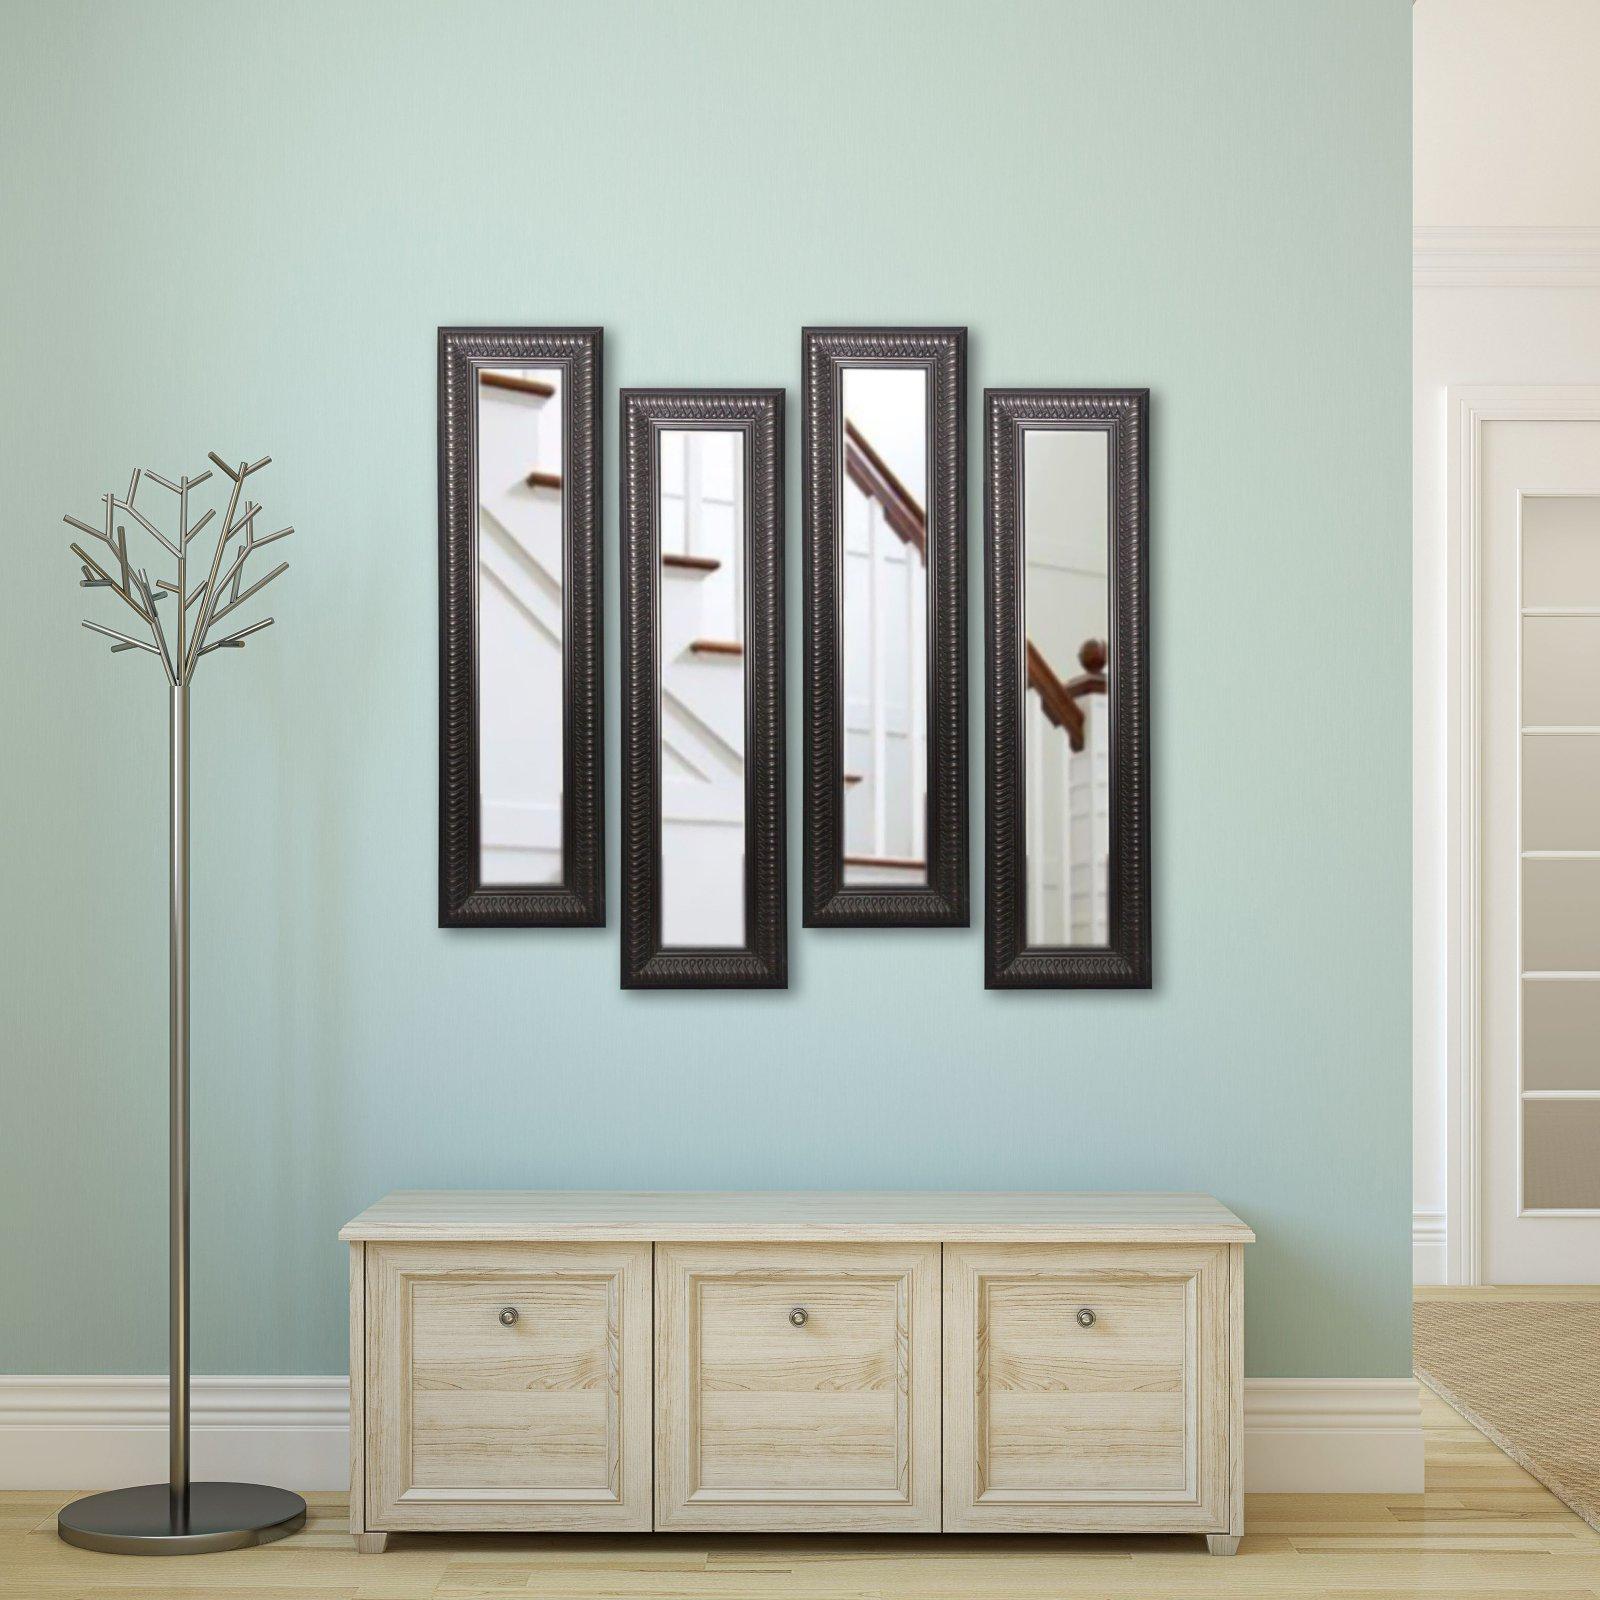 Rayne Mirrors Molly Dawn Royal Curve Wall Mirror